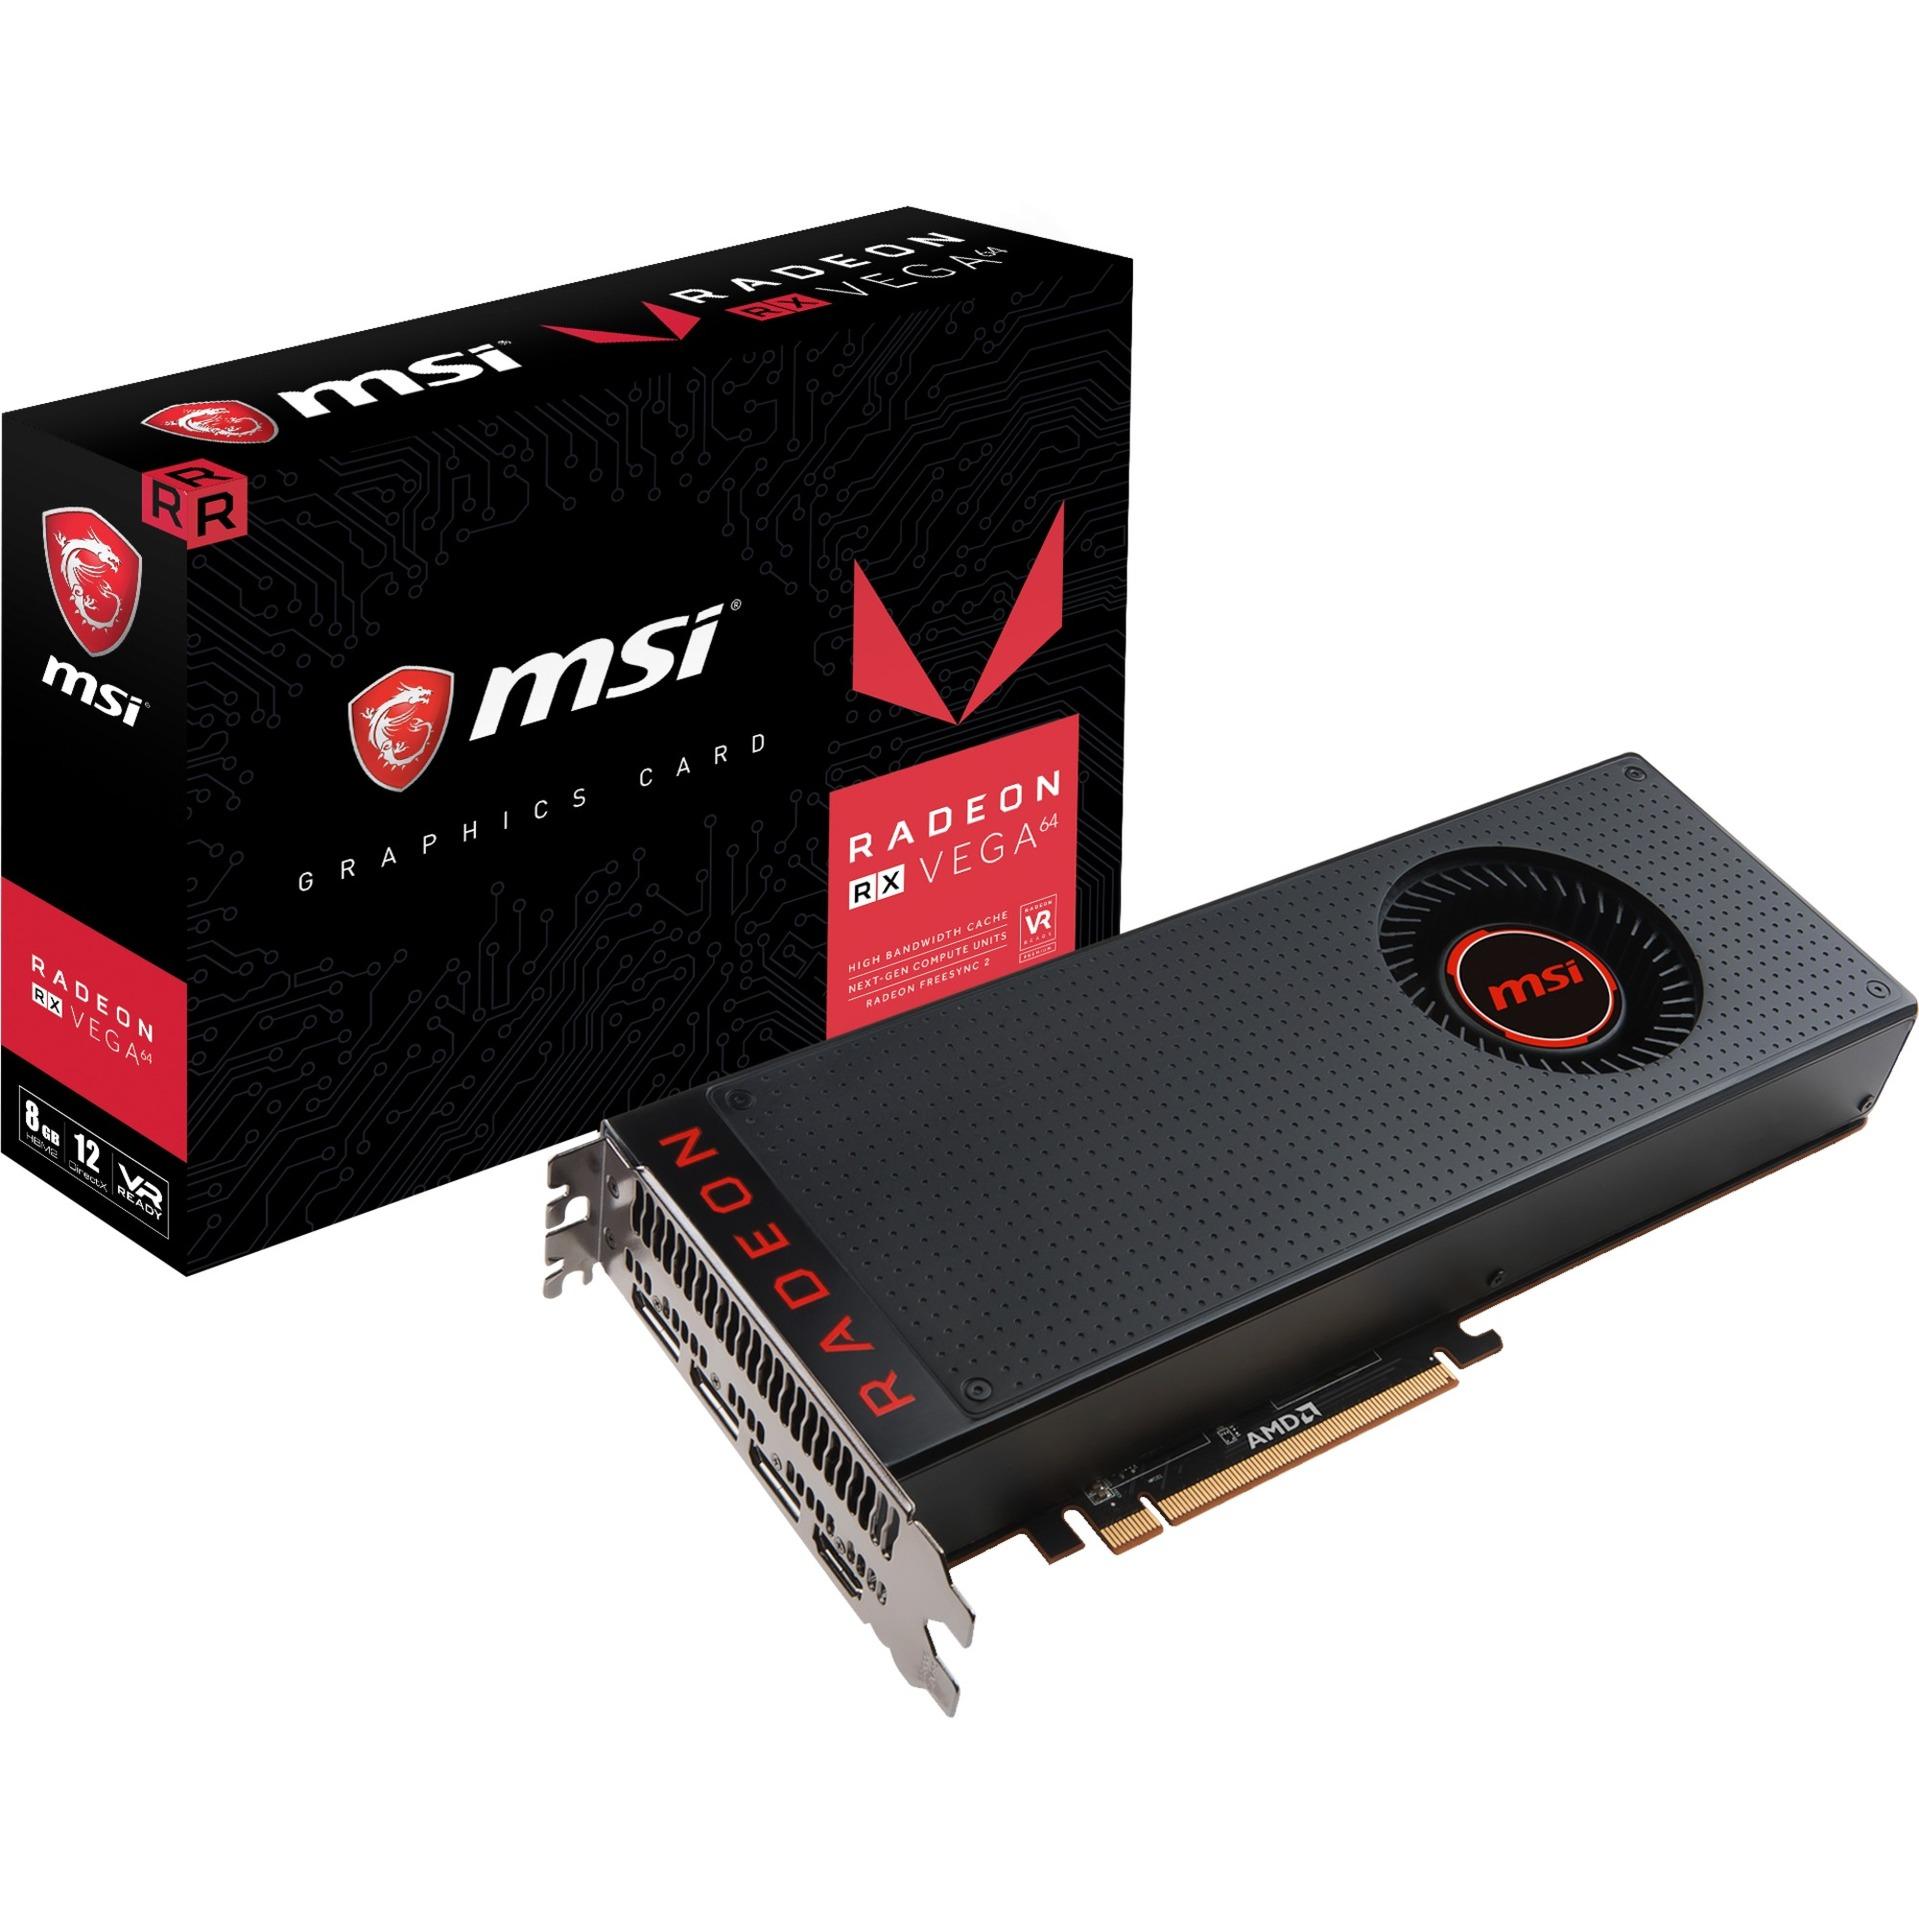 MSI Radeon RX VEGA 64 8G, Grafikkarte